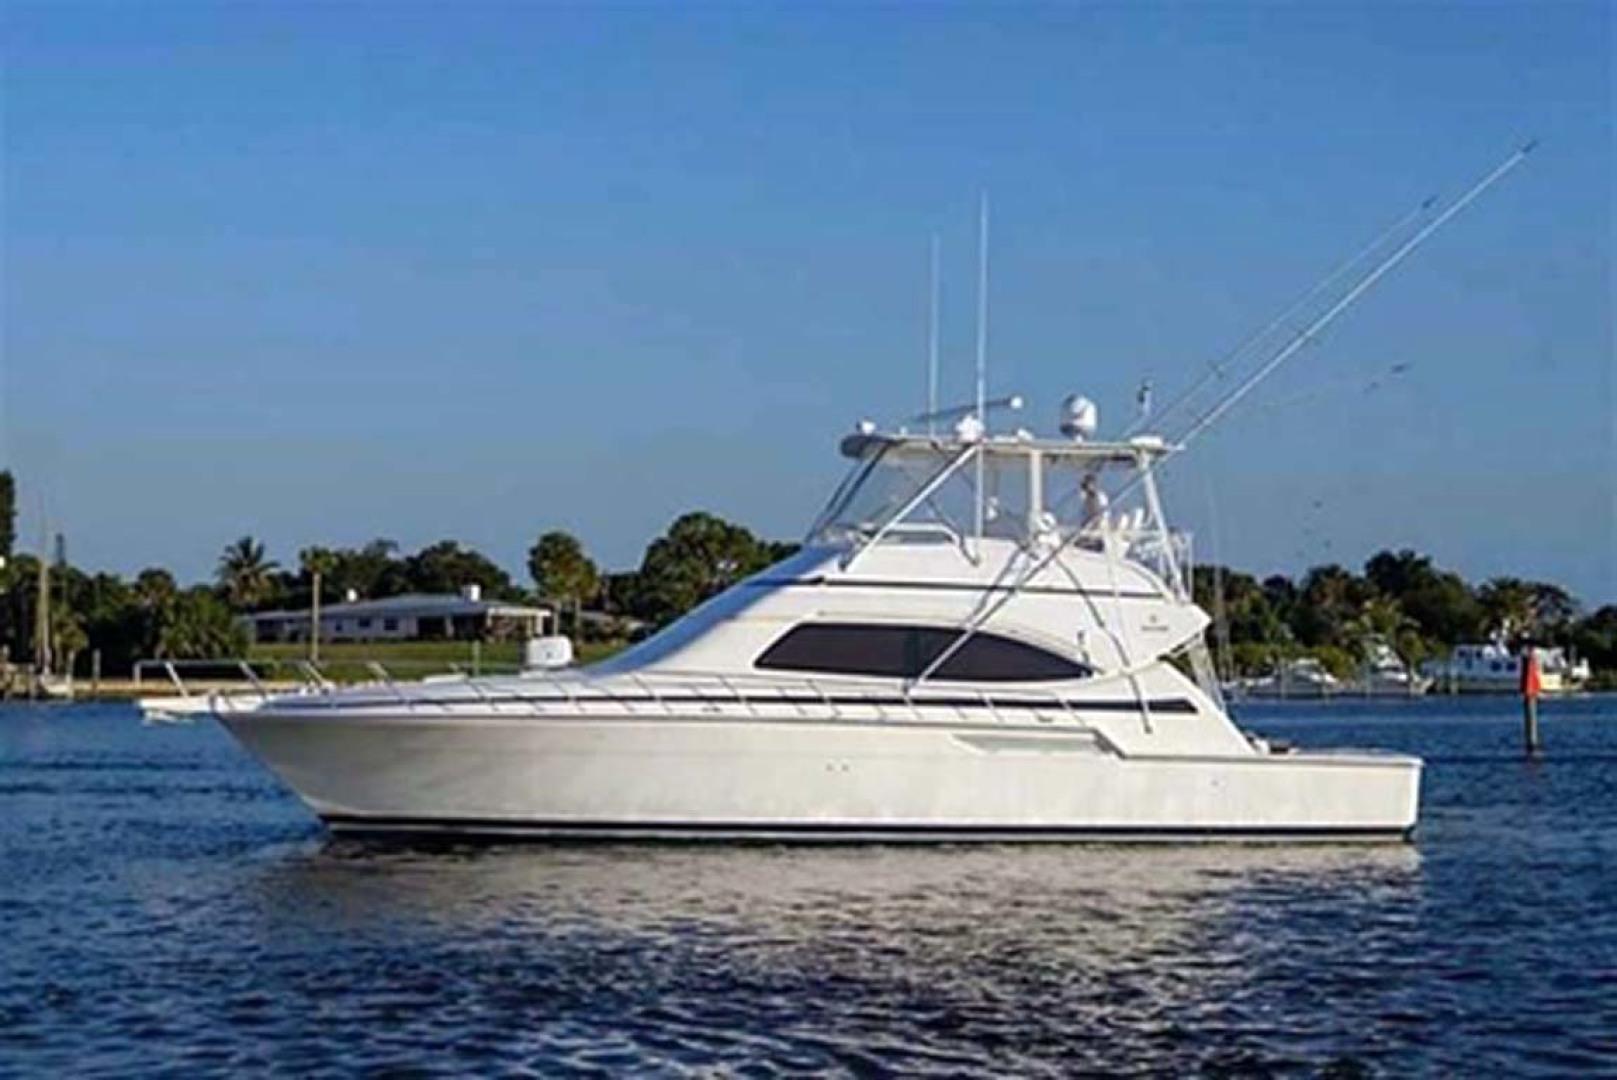 Bertram-510 Convertible 2002-Mary B Oceans Edge Hotel and Marina, Key West-Florida-United States-Running Profile-1129224 | Thumbnail